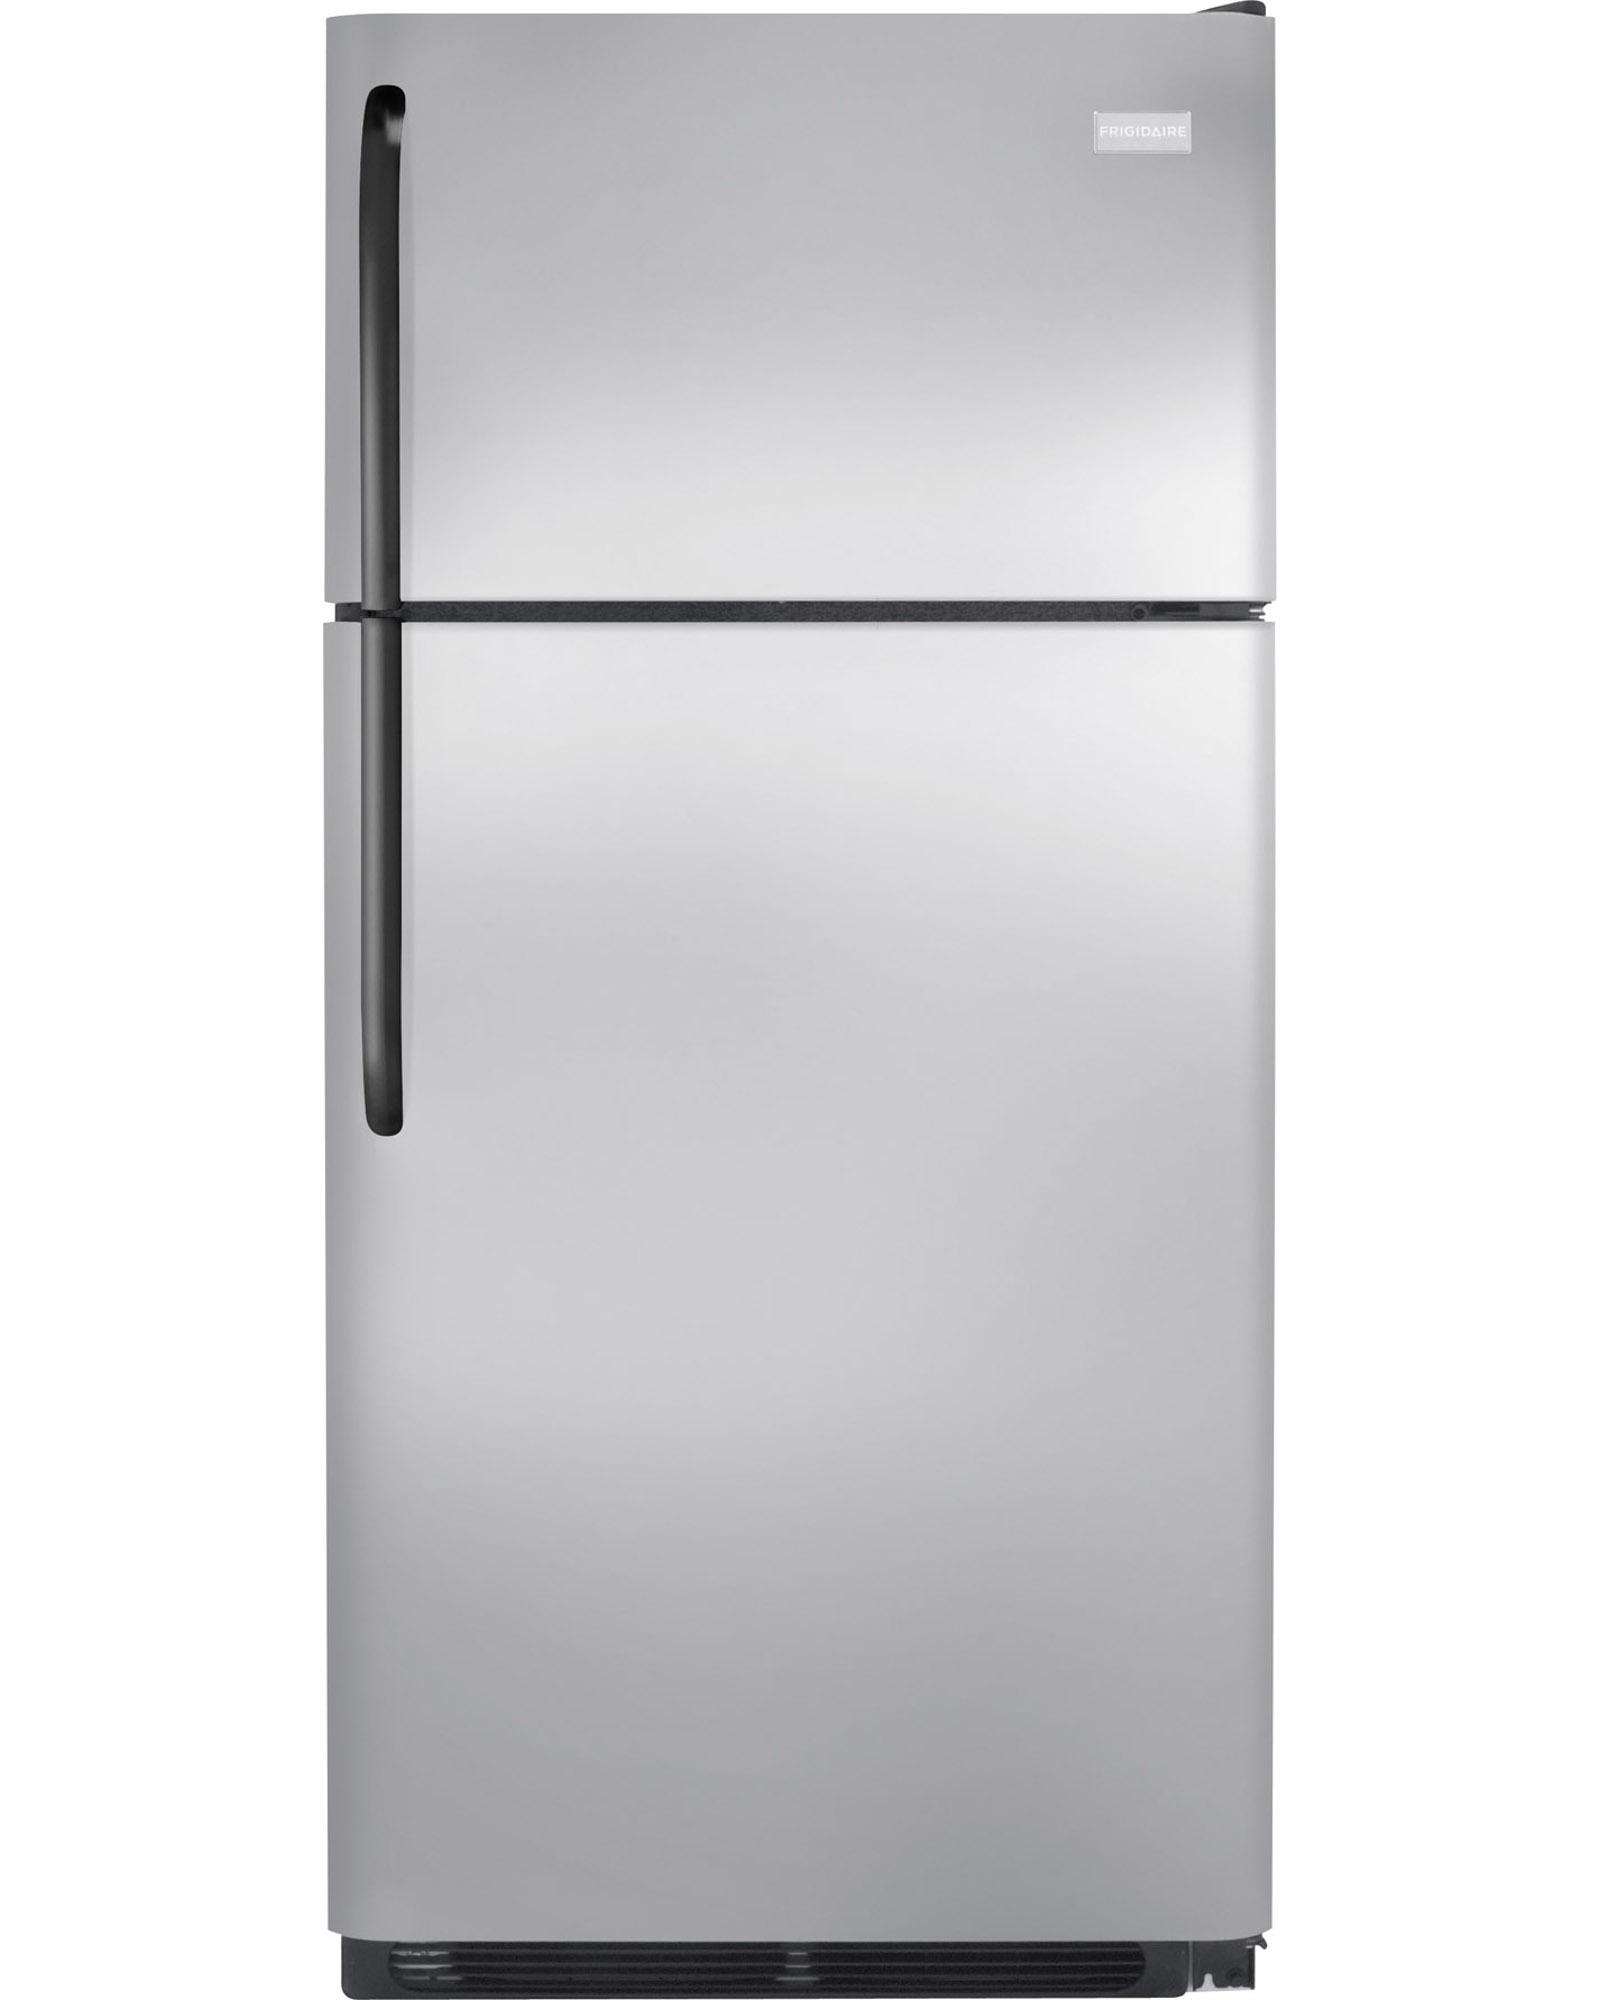 Best 62 Refrigerator Background on HipWallpaper Refrigerator 1600x2000